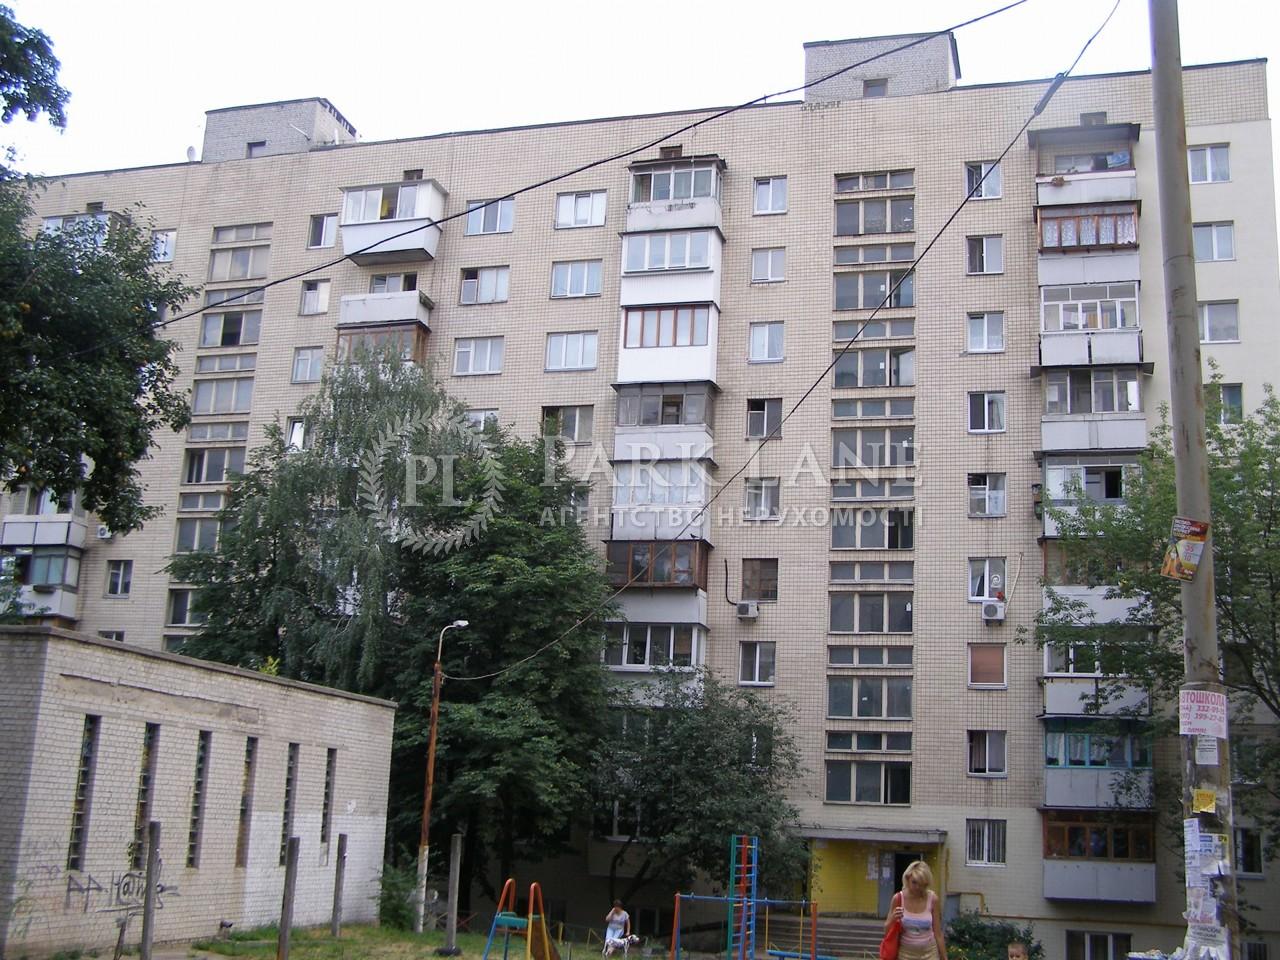 Квартира ул. Богдановская, 4, Киев, Z-548036 - Фото 10